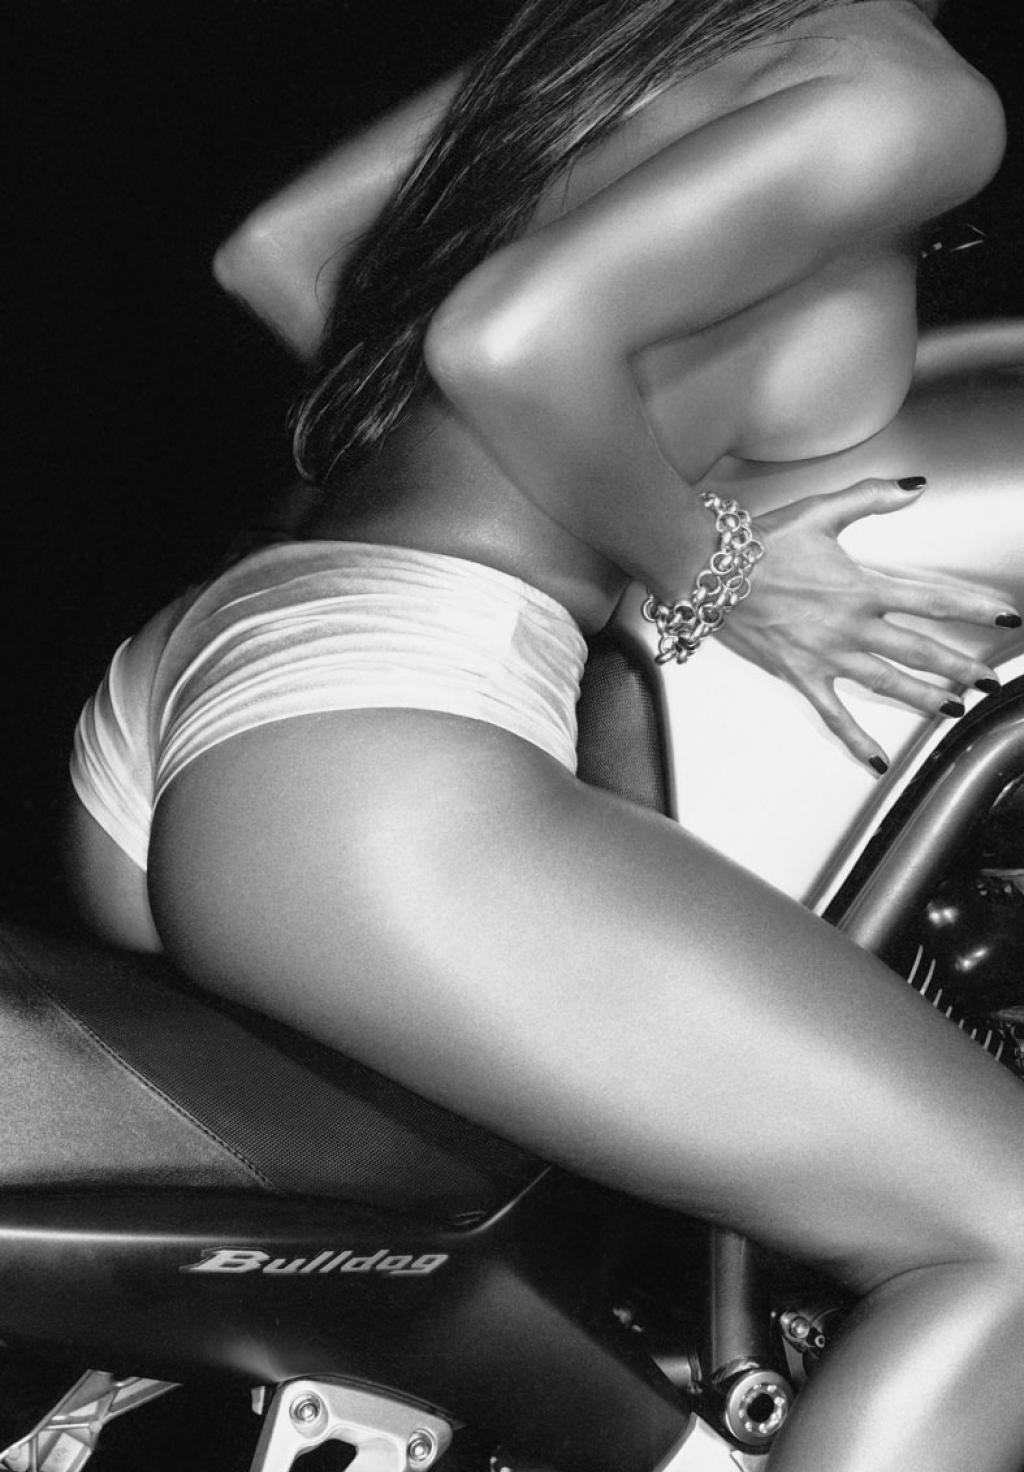 Mulheres de topless em moto, gostosa de topless, babes on bike with topless,gostosa de moto, woman motorcycle topless, woman bike topless, sexy on bike, sexy on motorcycle, babes on bike,ragazza in moto,donna calda in moto, femme chaude sur la moto, mujer caliente en motocicleta, chica en moto, heiße Frau auf dem Motorrad